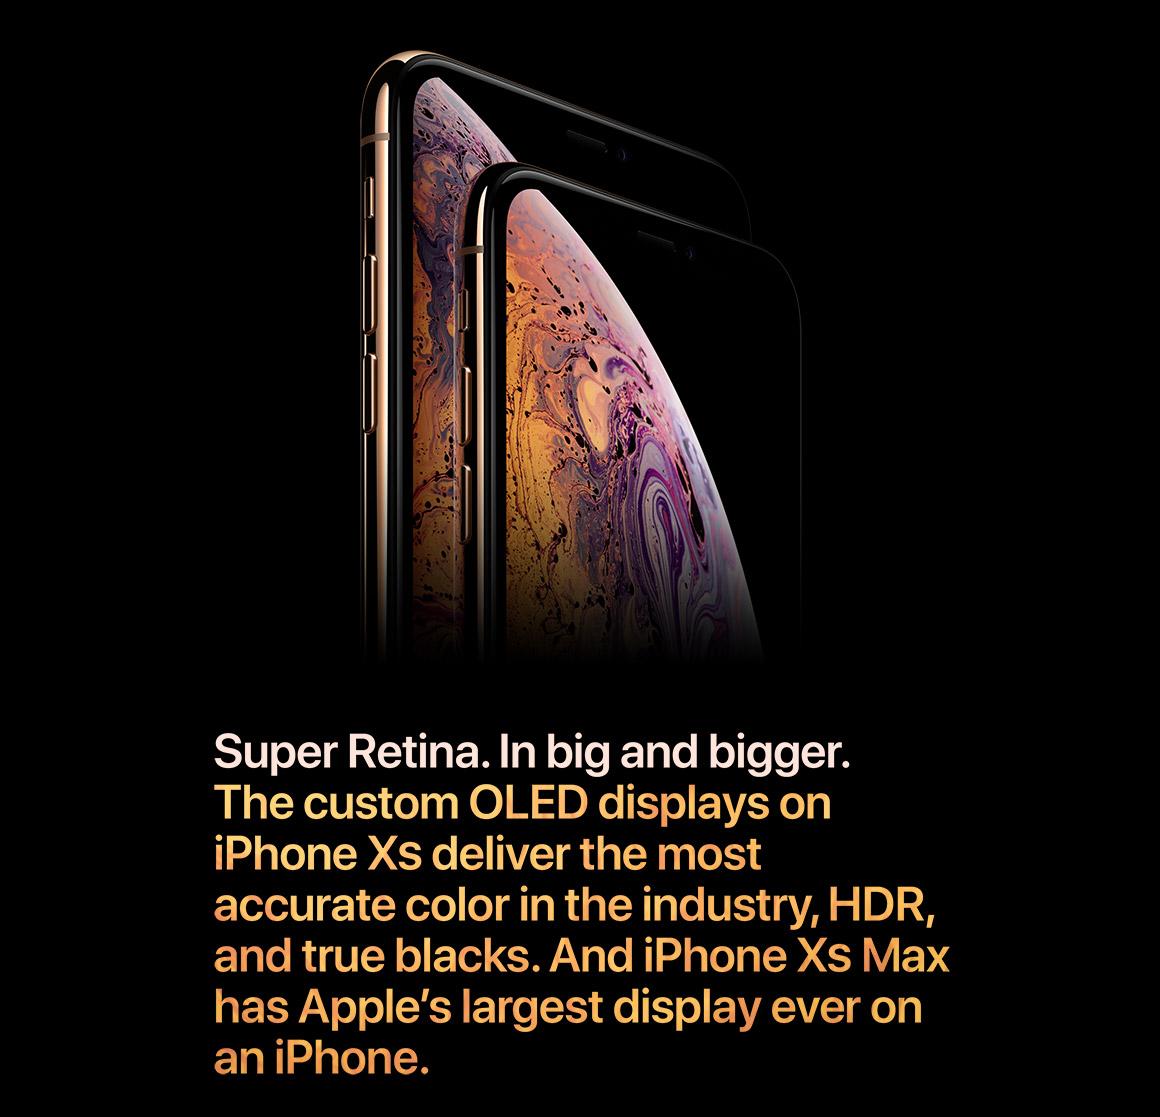 Super Retina